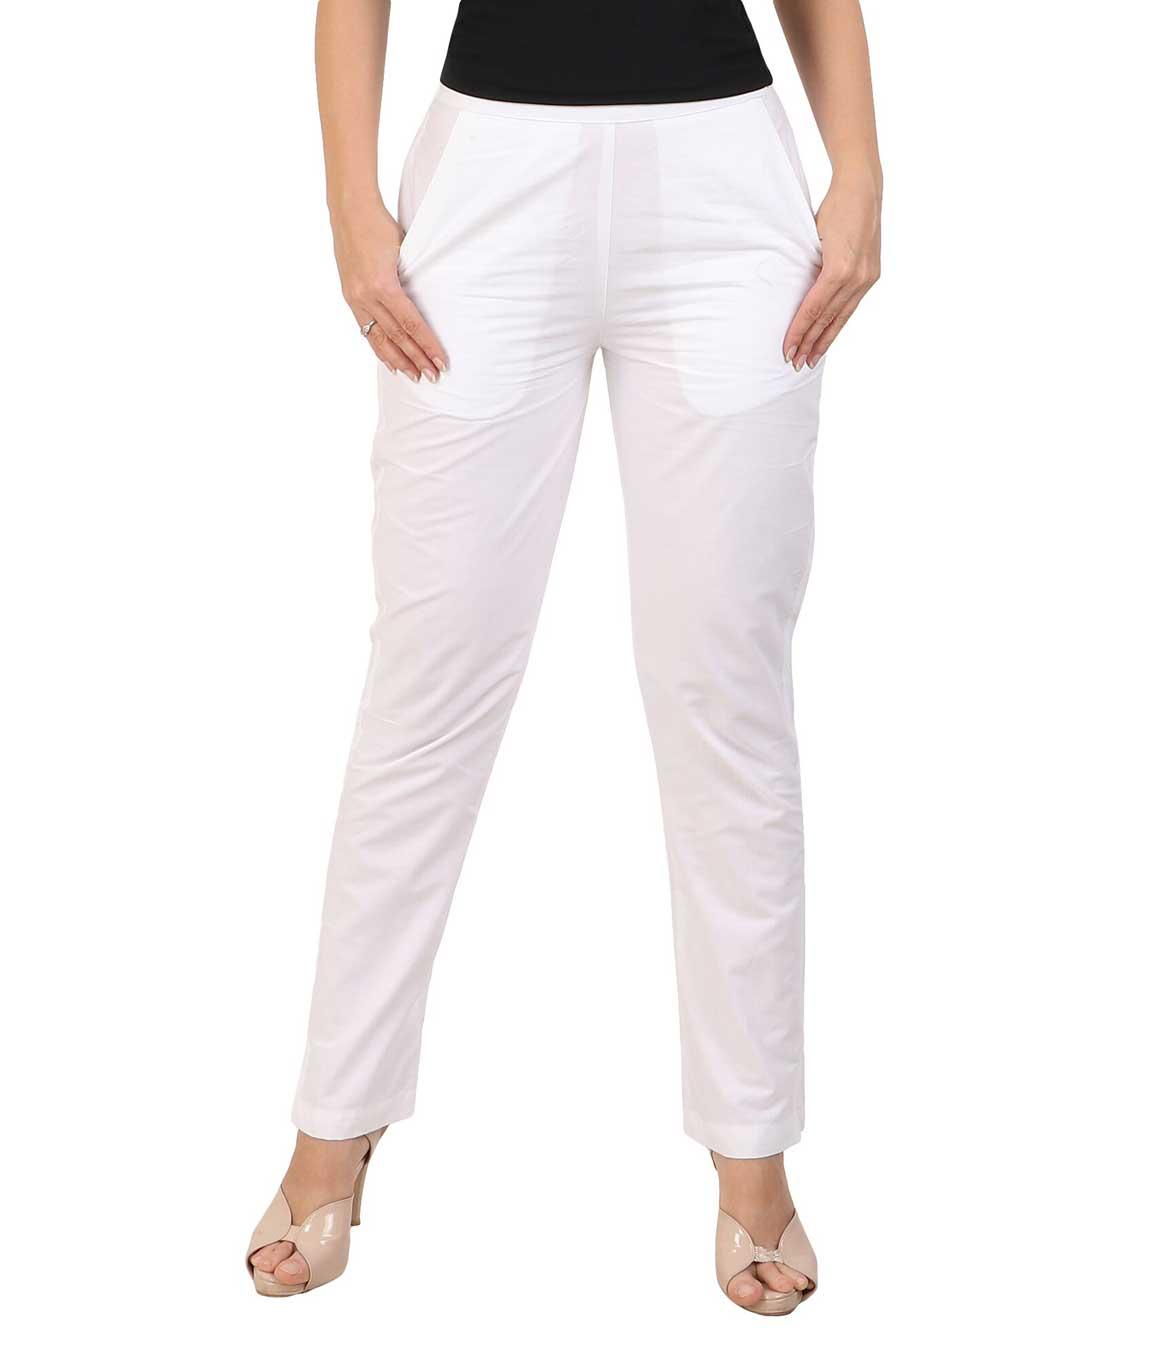 Makxziya Women`s White  Regular Fit Cotton Trouser(White)